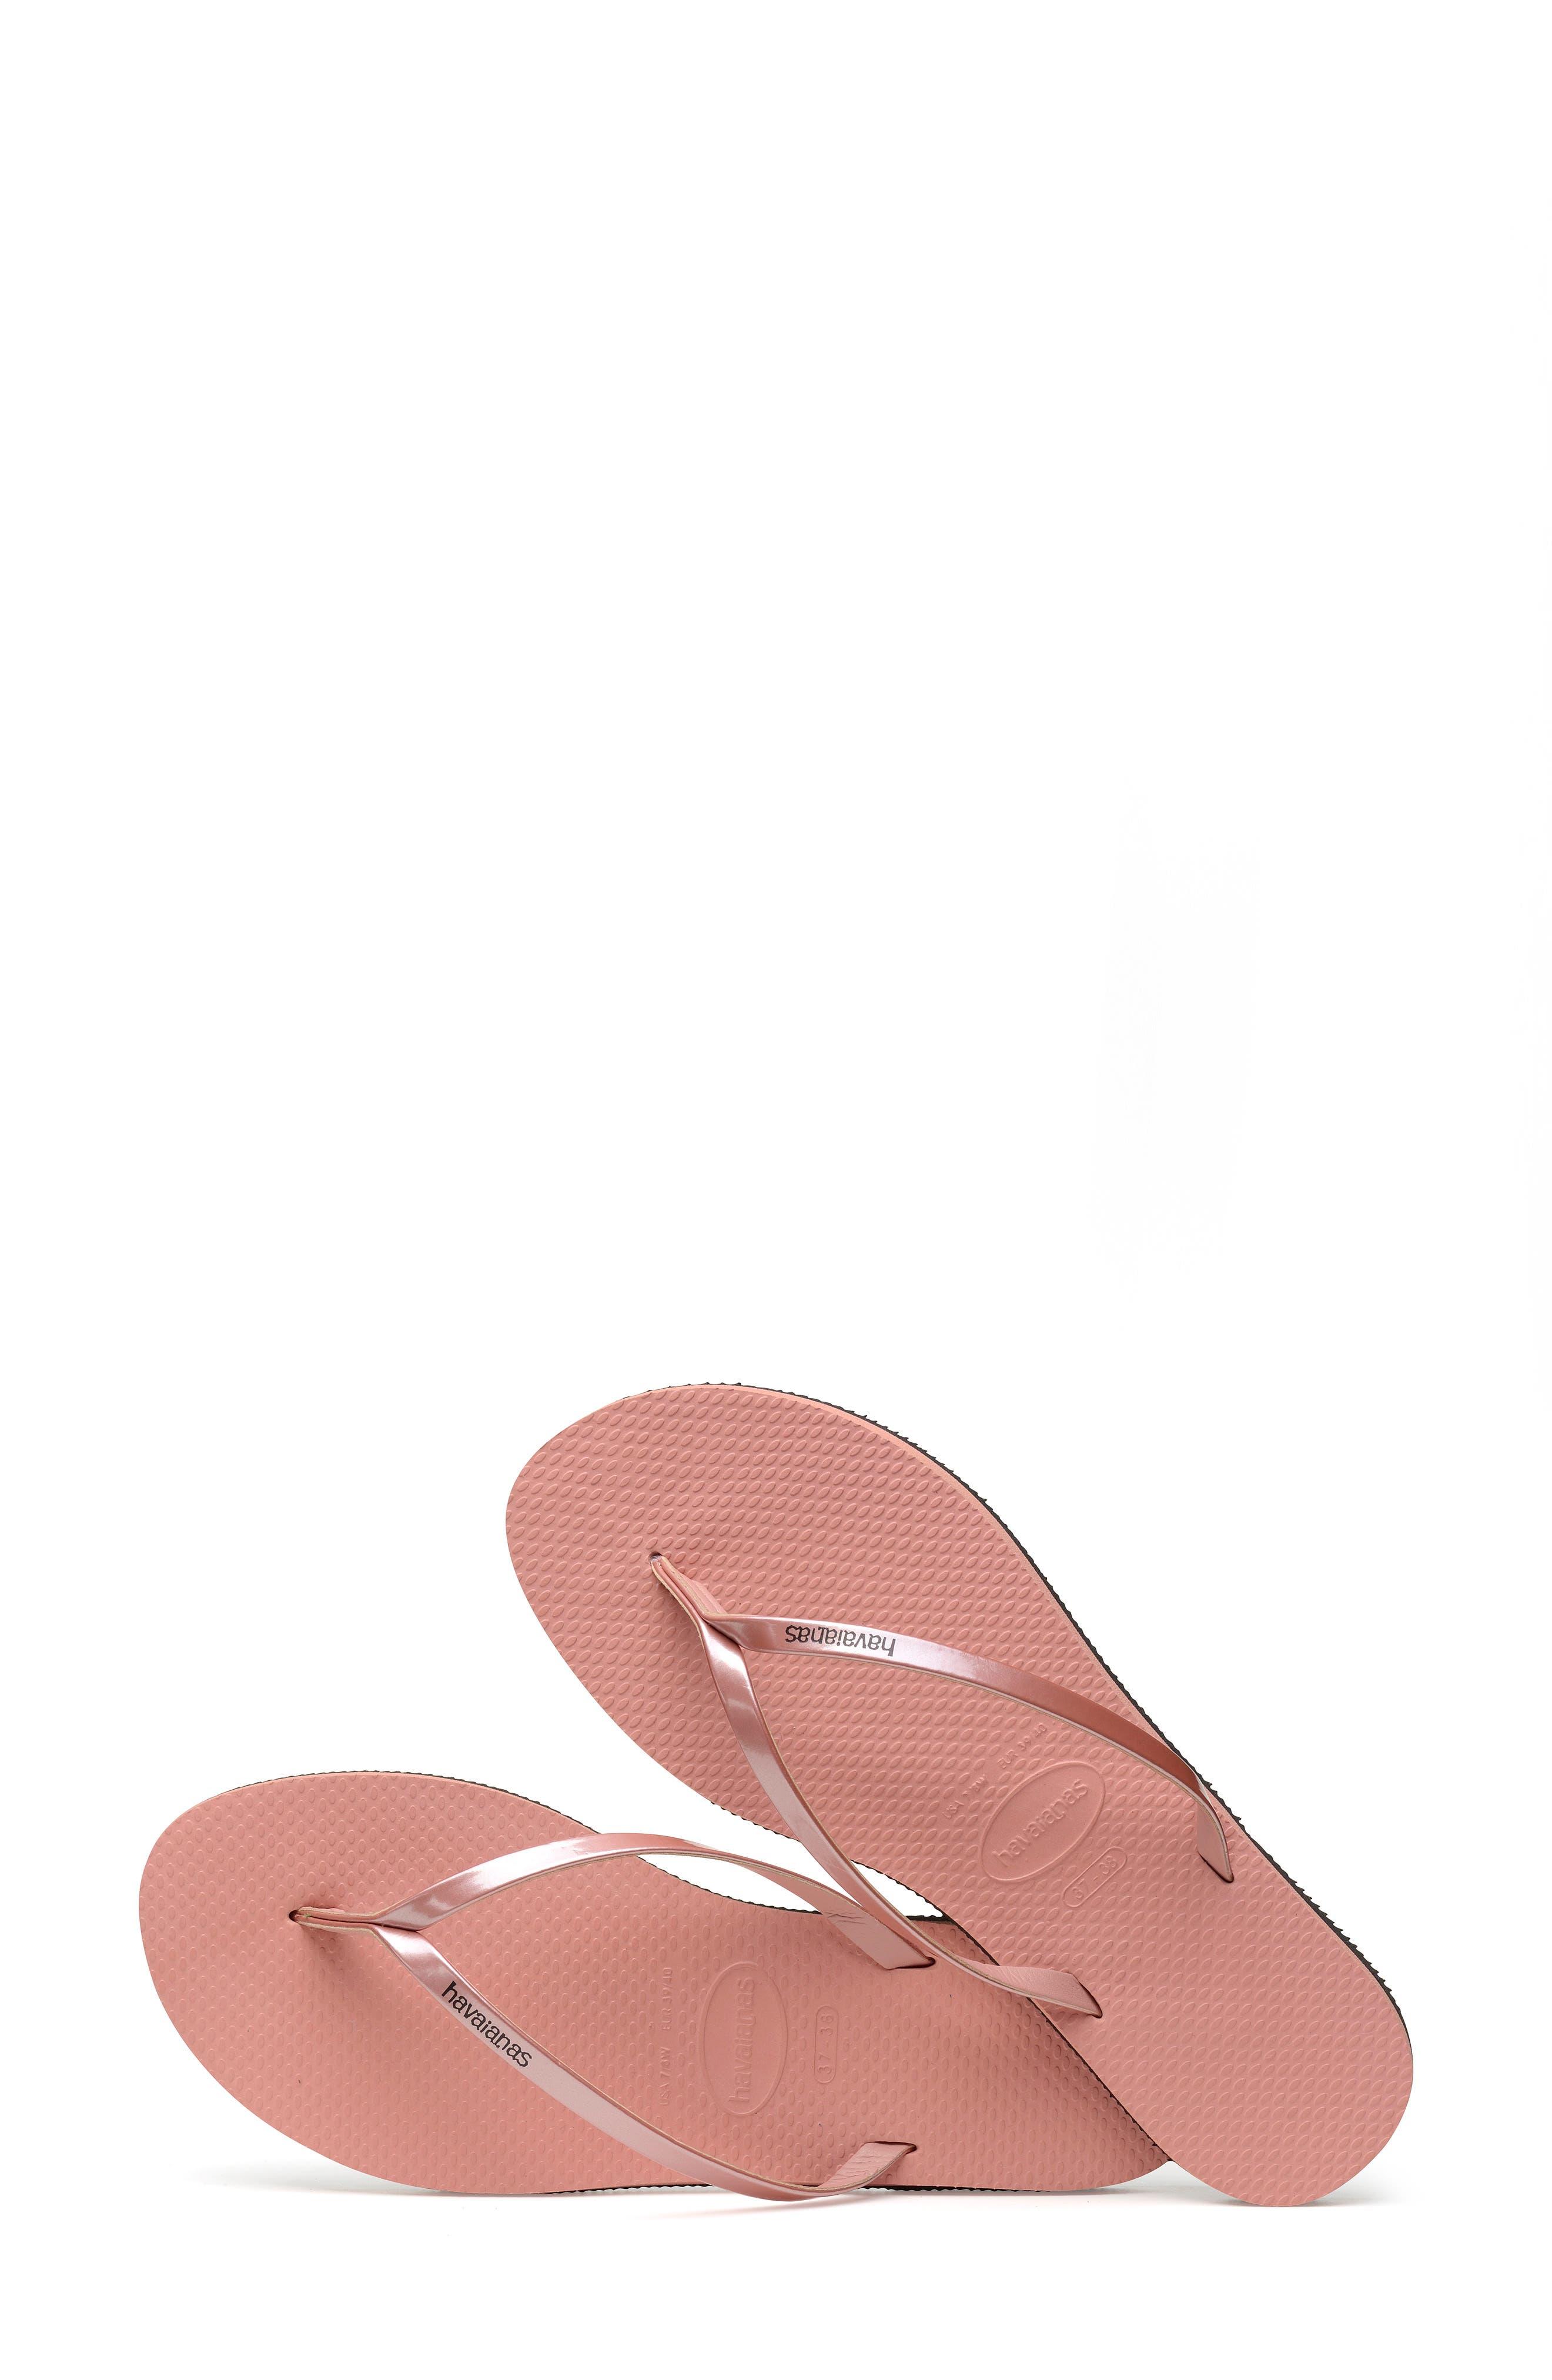 HAVAIANAS, 'You' Flip Flop, Alternate thumbnail 7, color, ROSE NUDE